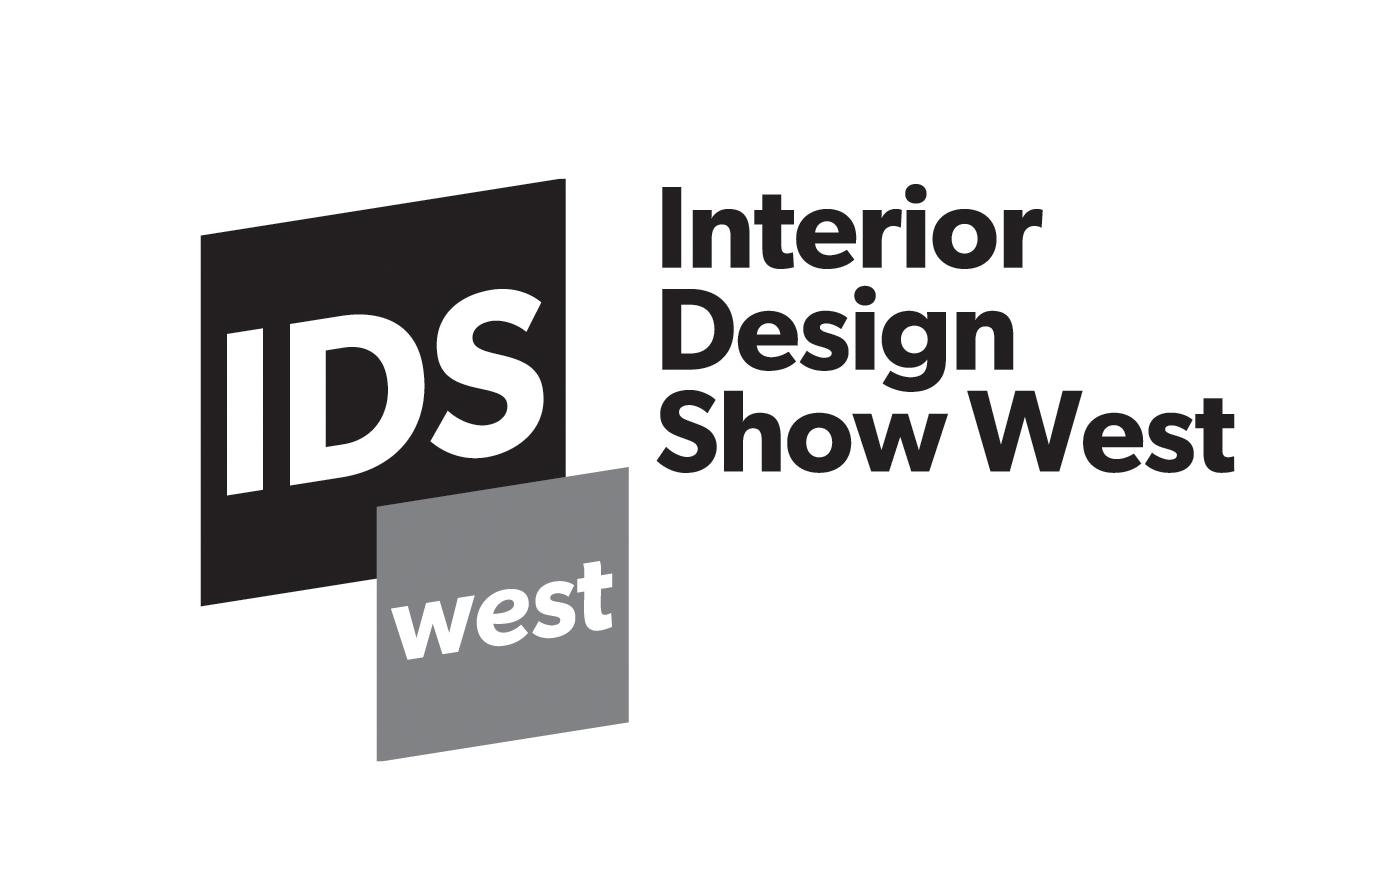 Interior Design Show West